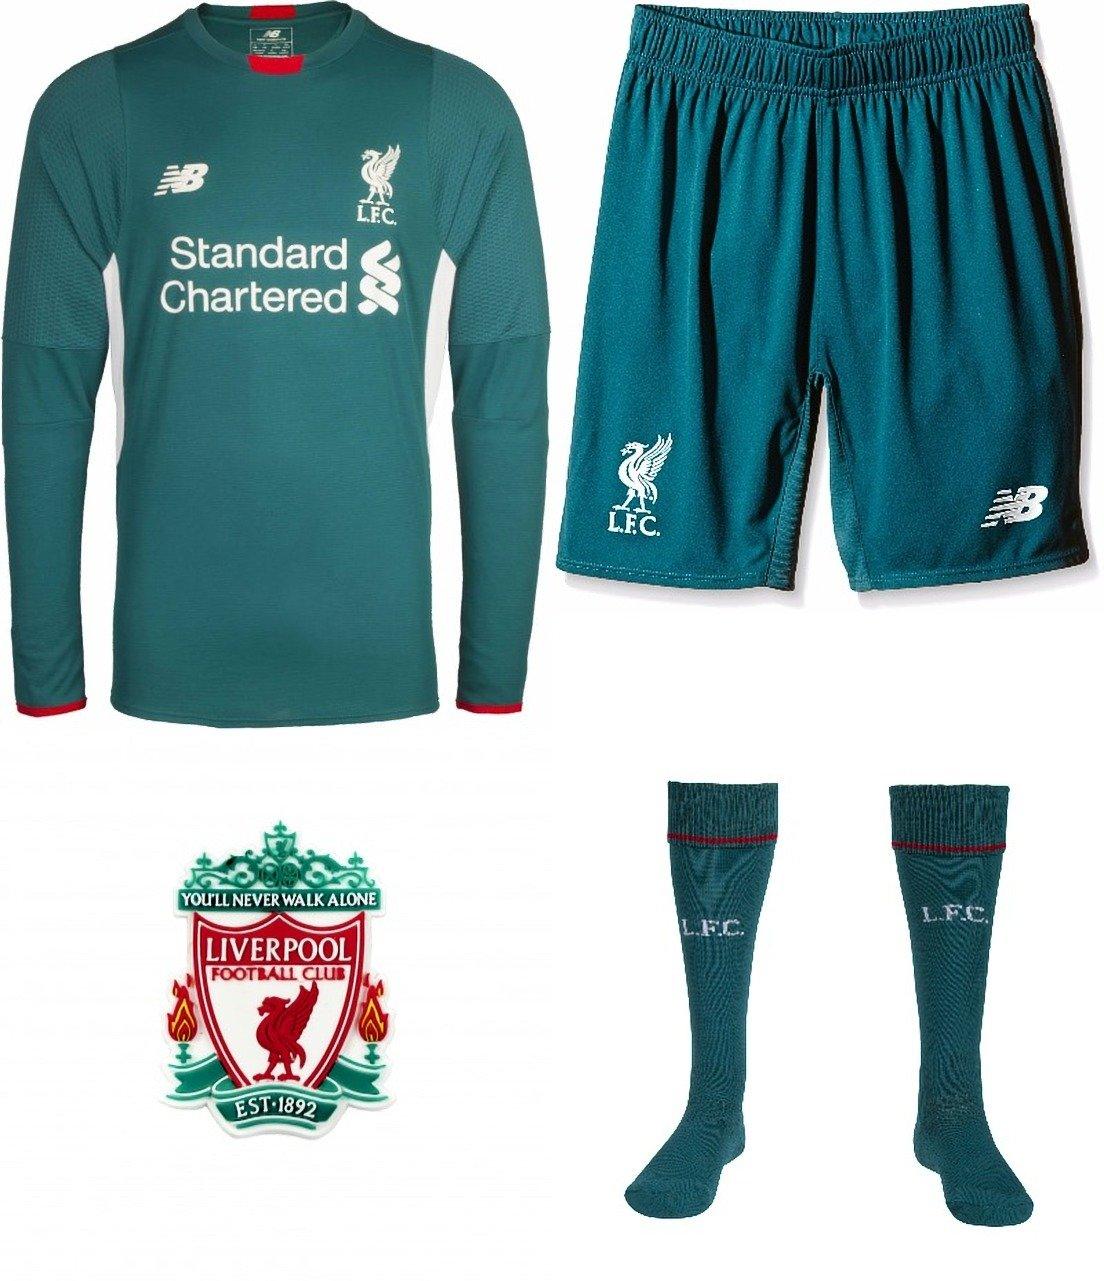 Liverpool Goalkeeper Full Kit Long Sleeve Shirt Shorts Socks Kids 2015 16 Small Boys 6 7 Years Amazon Co Uk Sports Outdoors